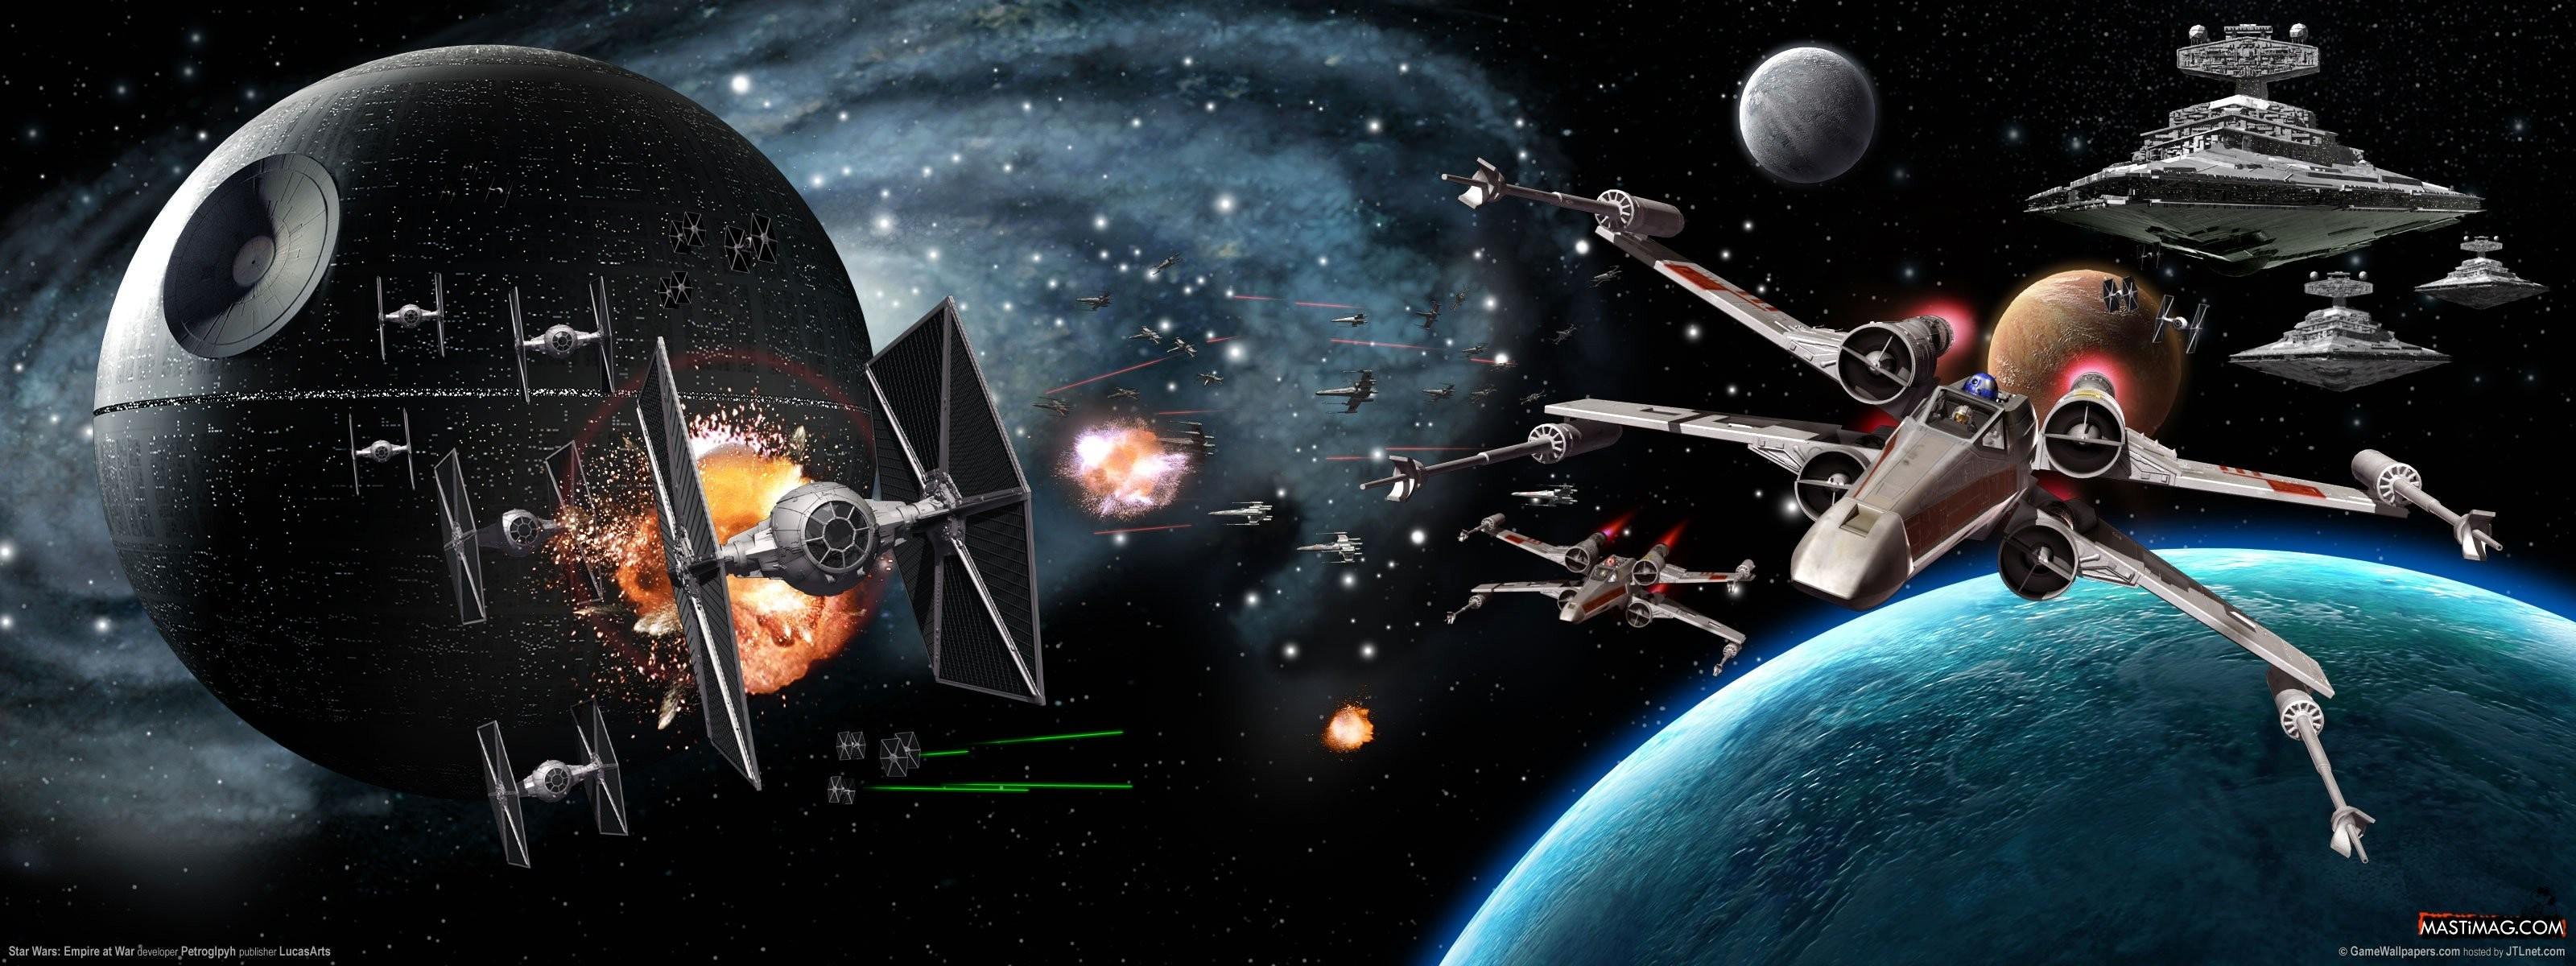 star wars wallpaper 1 star wars wallpaper 2 …